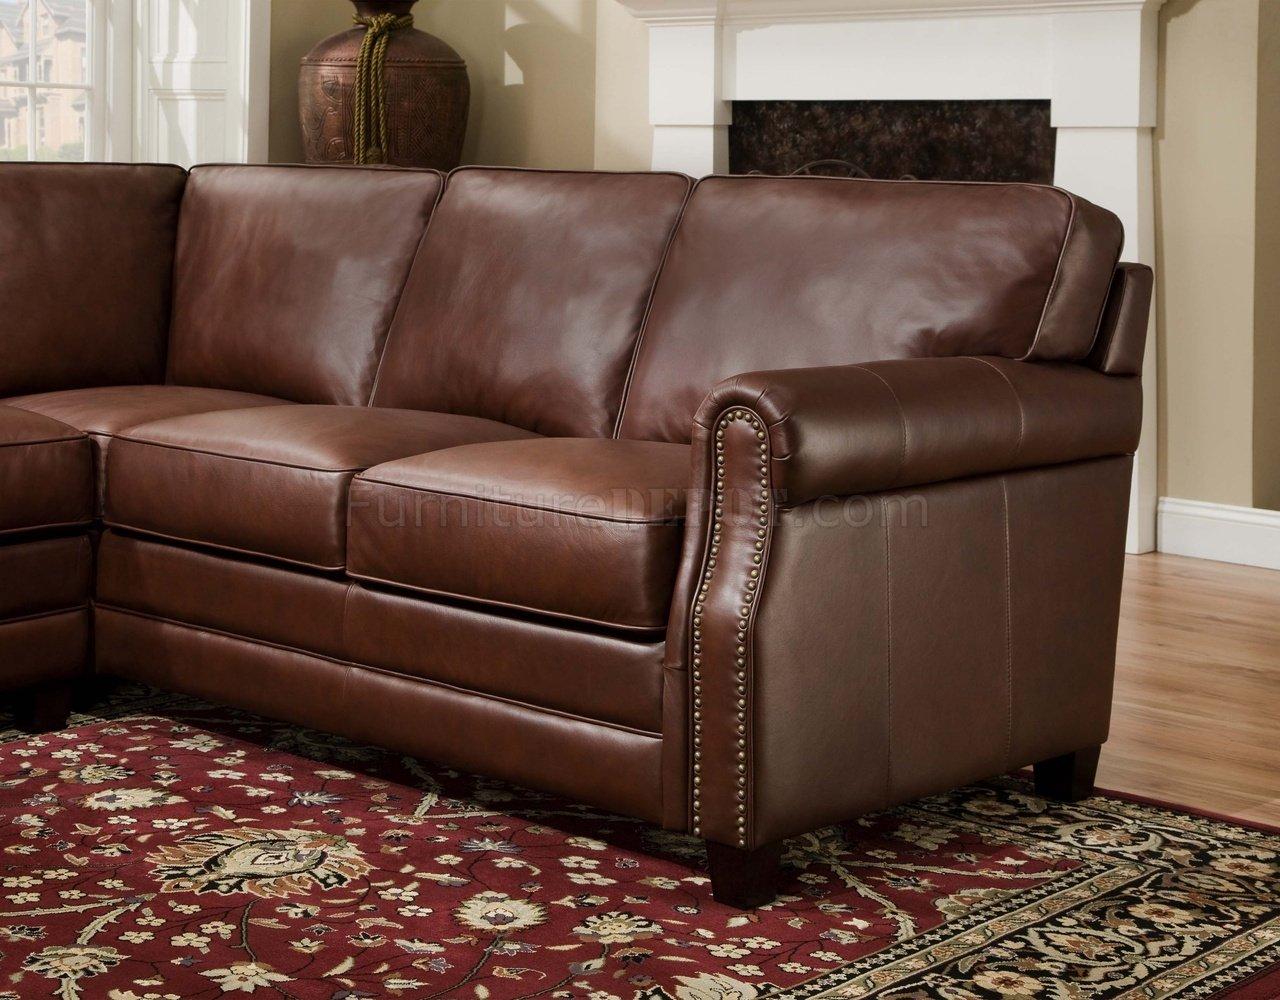 Cocoa Brown Top Grain Italian Leather Traditional